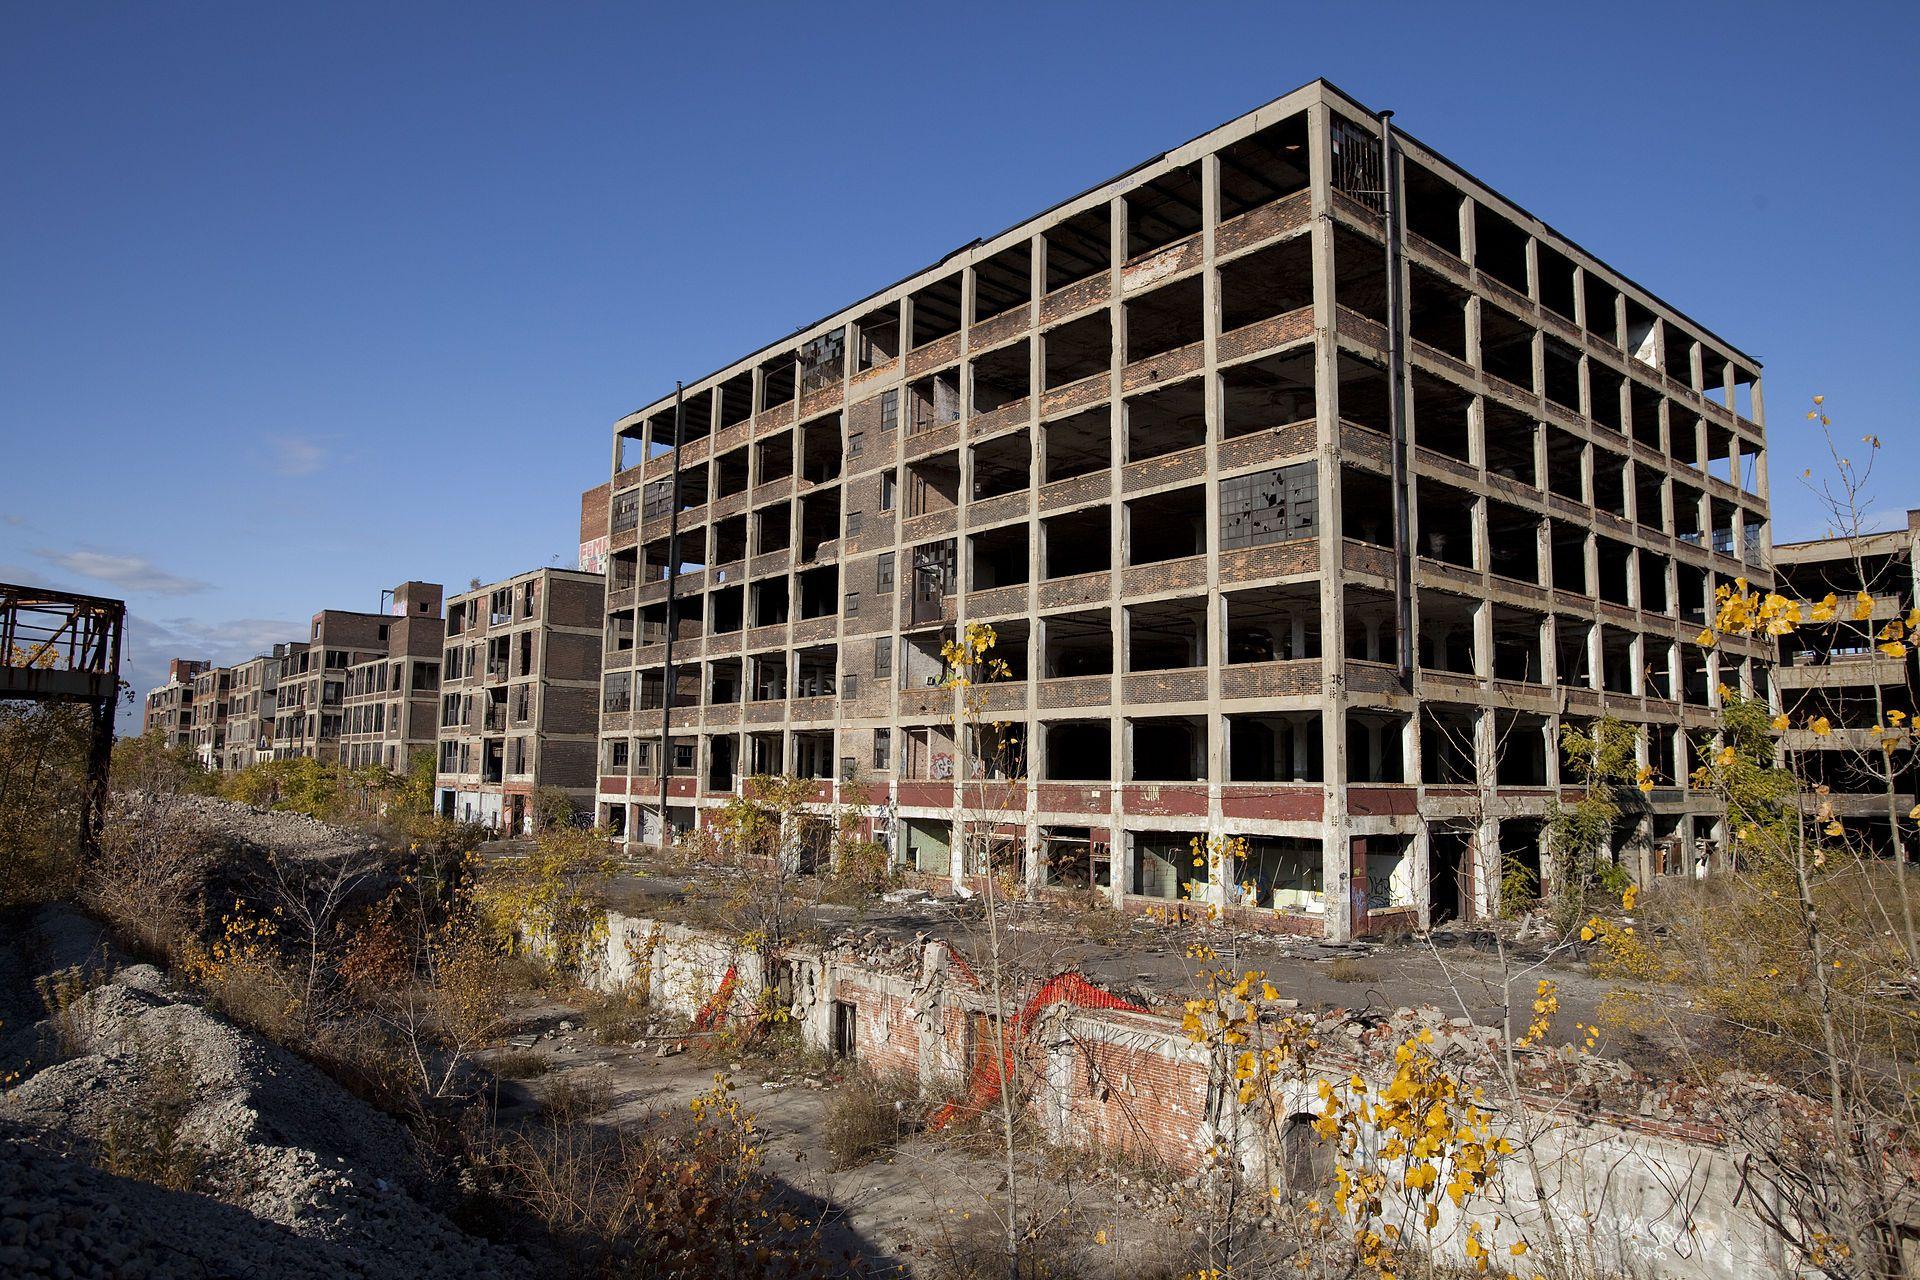 Abandoned Packard Automobile Factory Detroit 200 - Упадок Детройта — Википедия